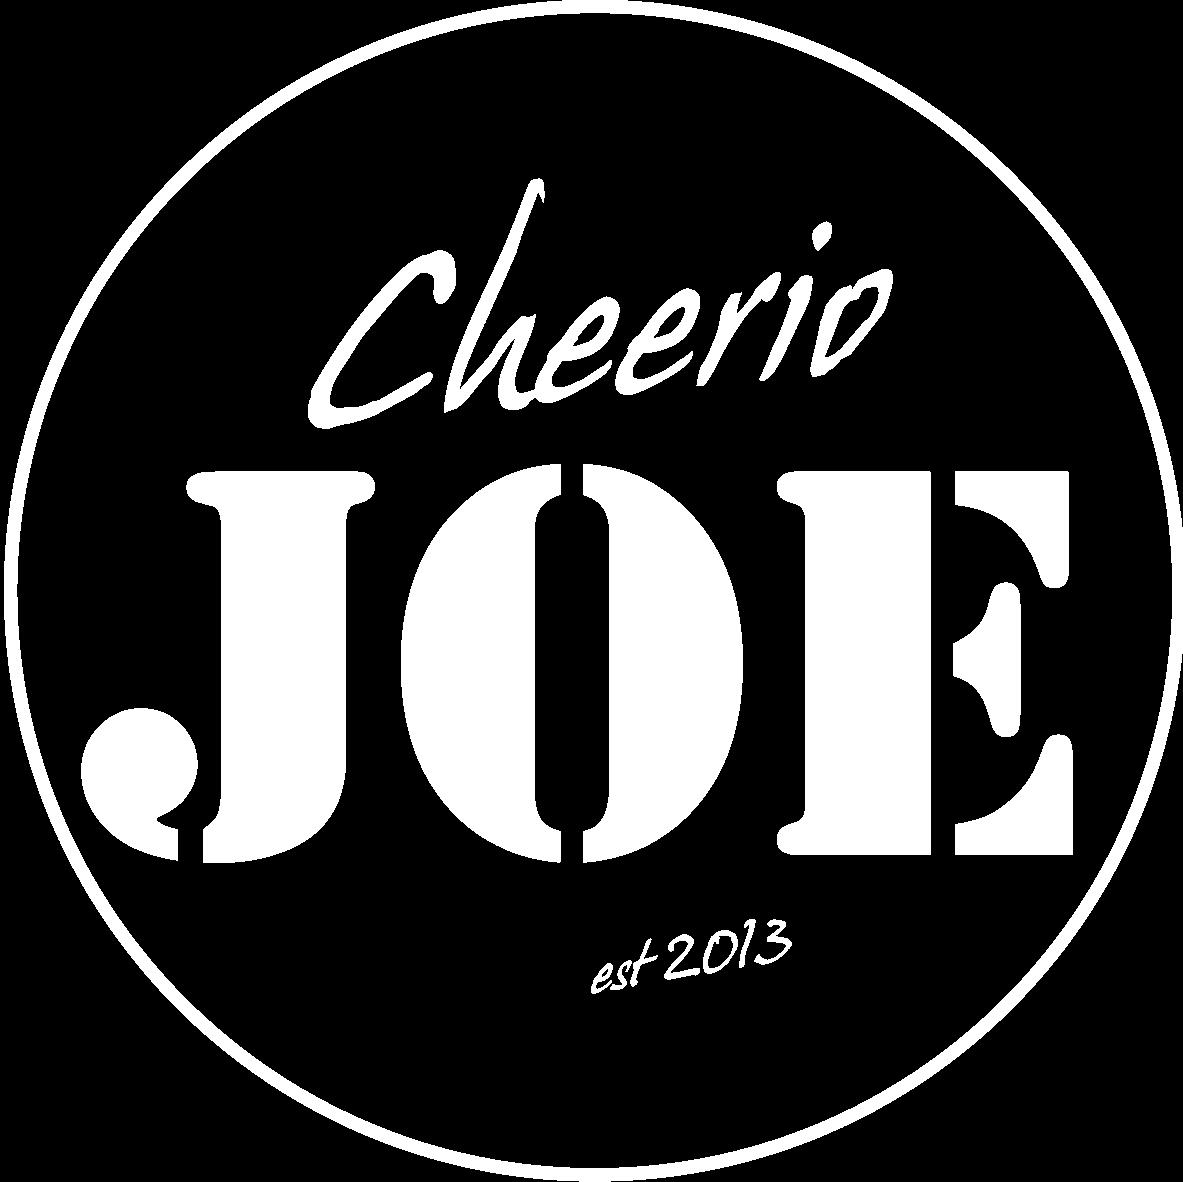 Cheerio Joe Bandlogo weiß mit Kreis